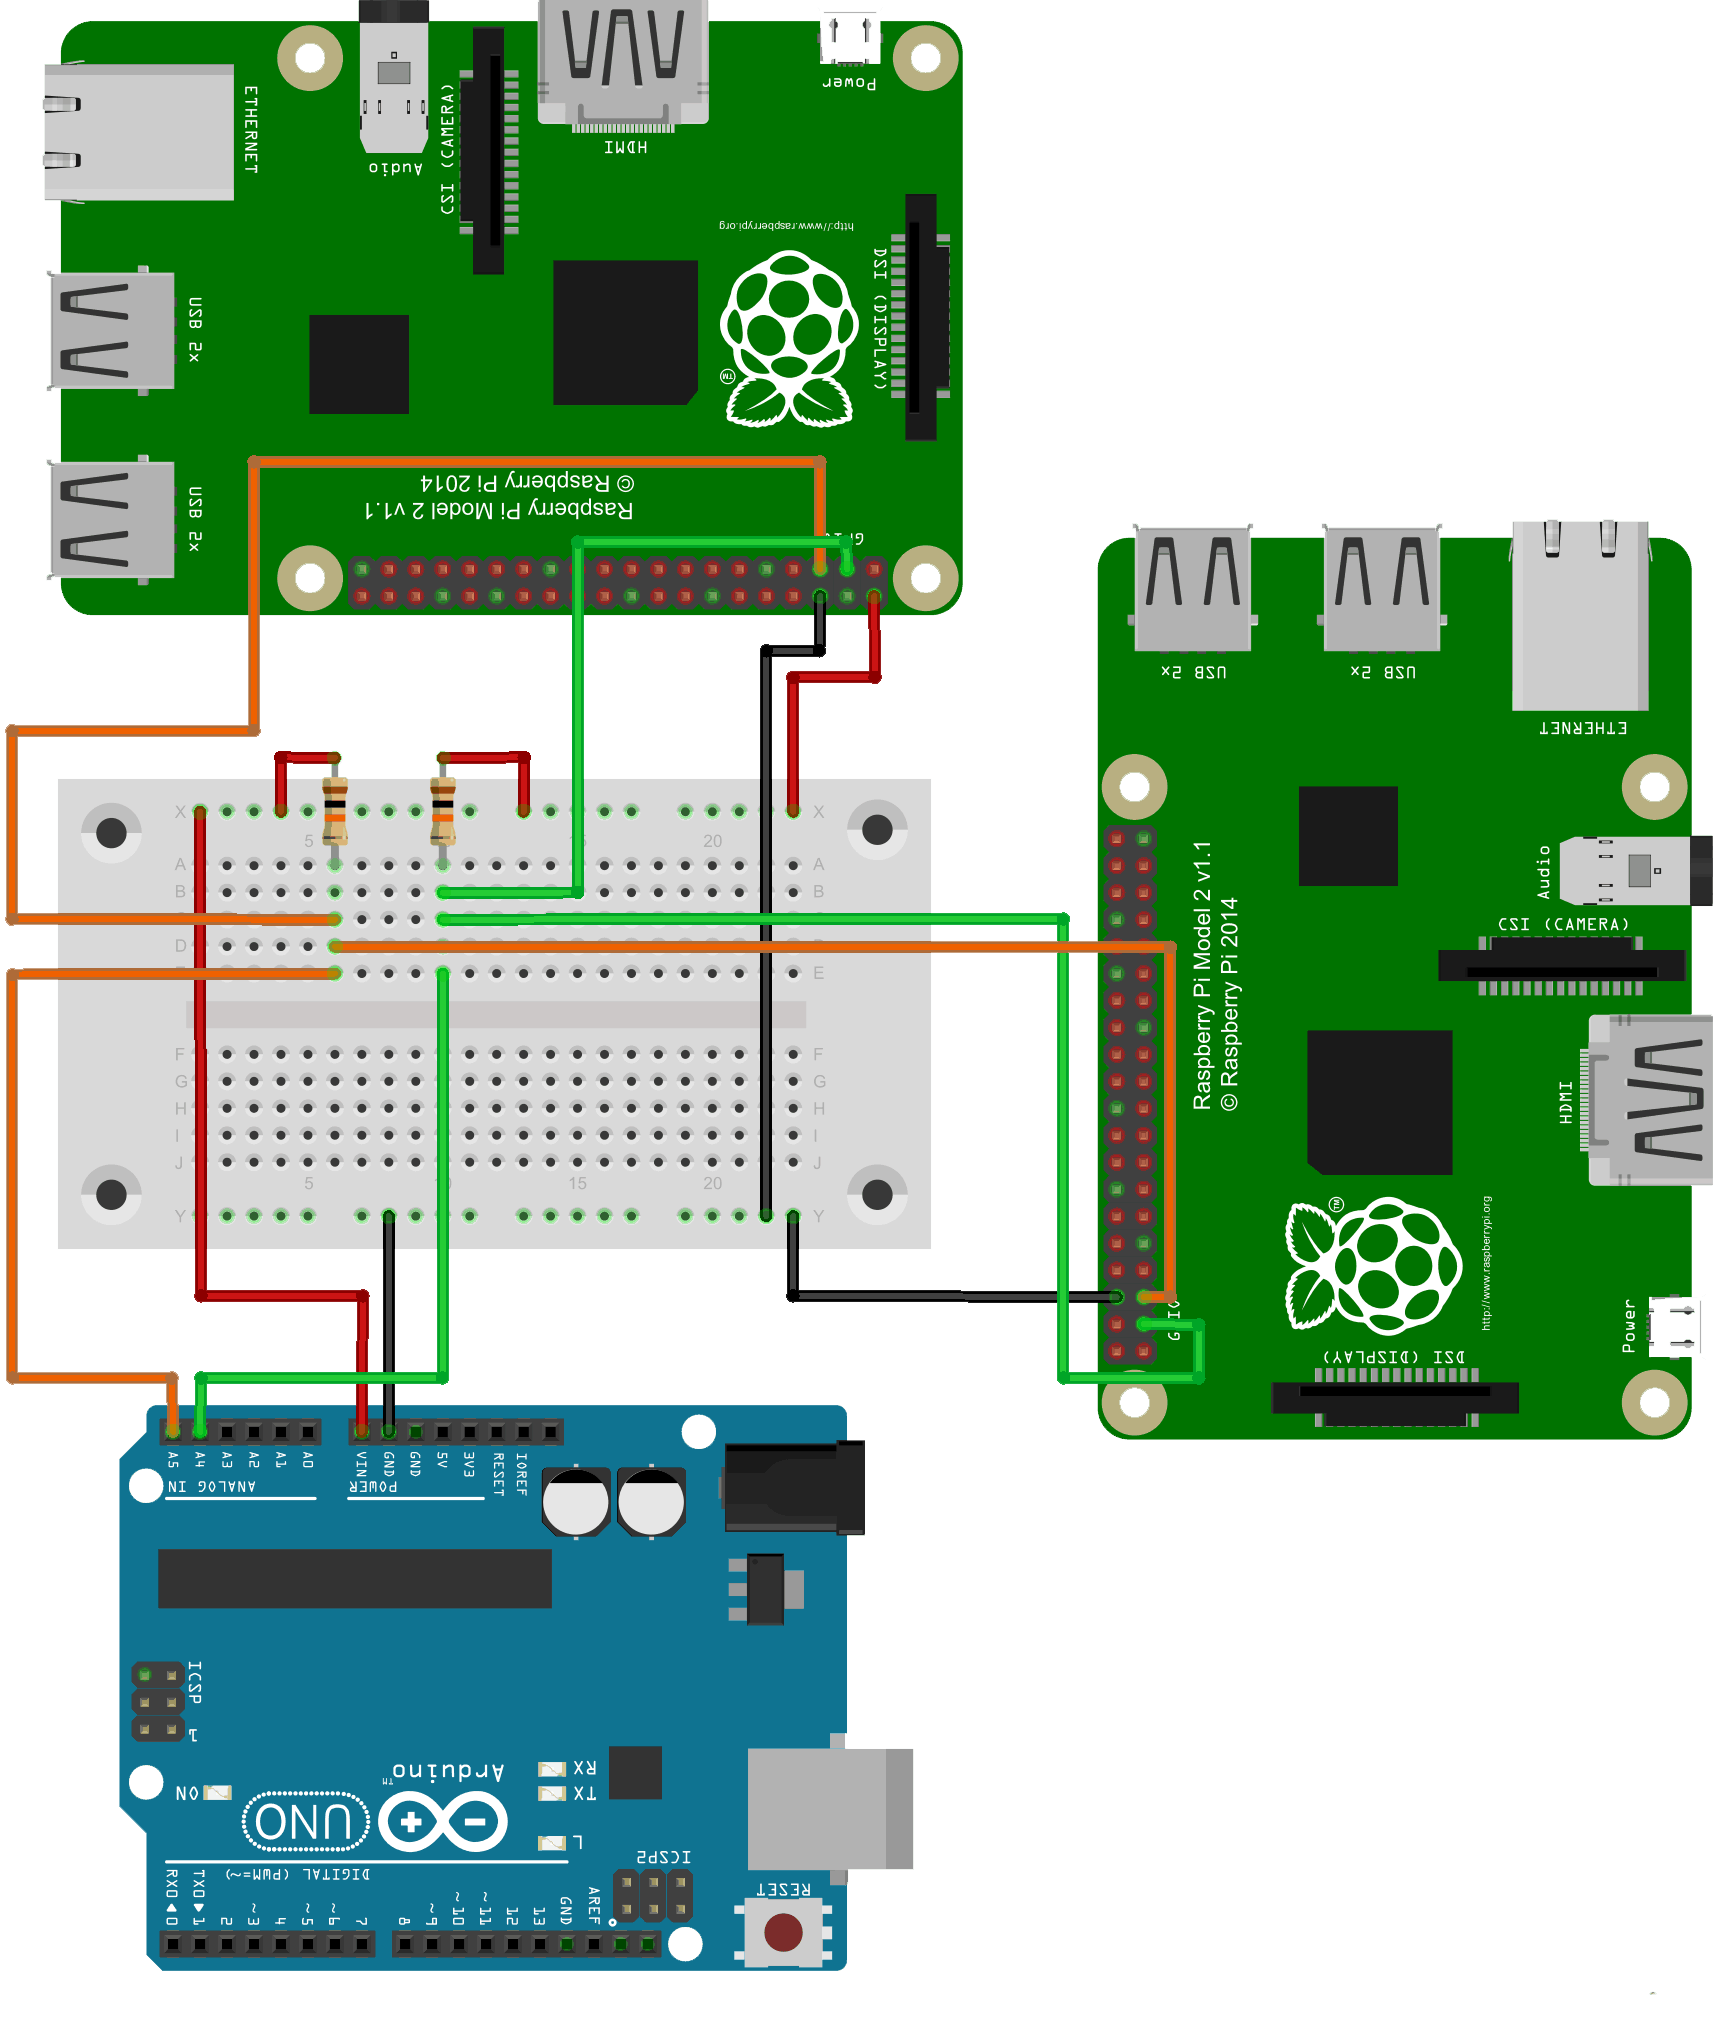 Wiringpi Arduino I2c Block And Schematic Diagrams Bluetooth How To Work With Communication In Raspberry Pi Radiostudio Rh Radiostud Io 1602